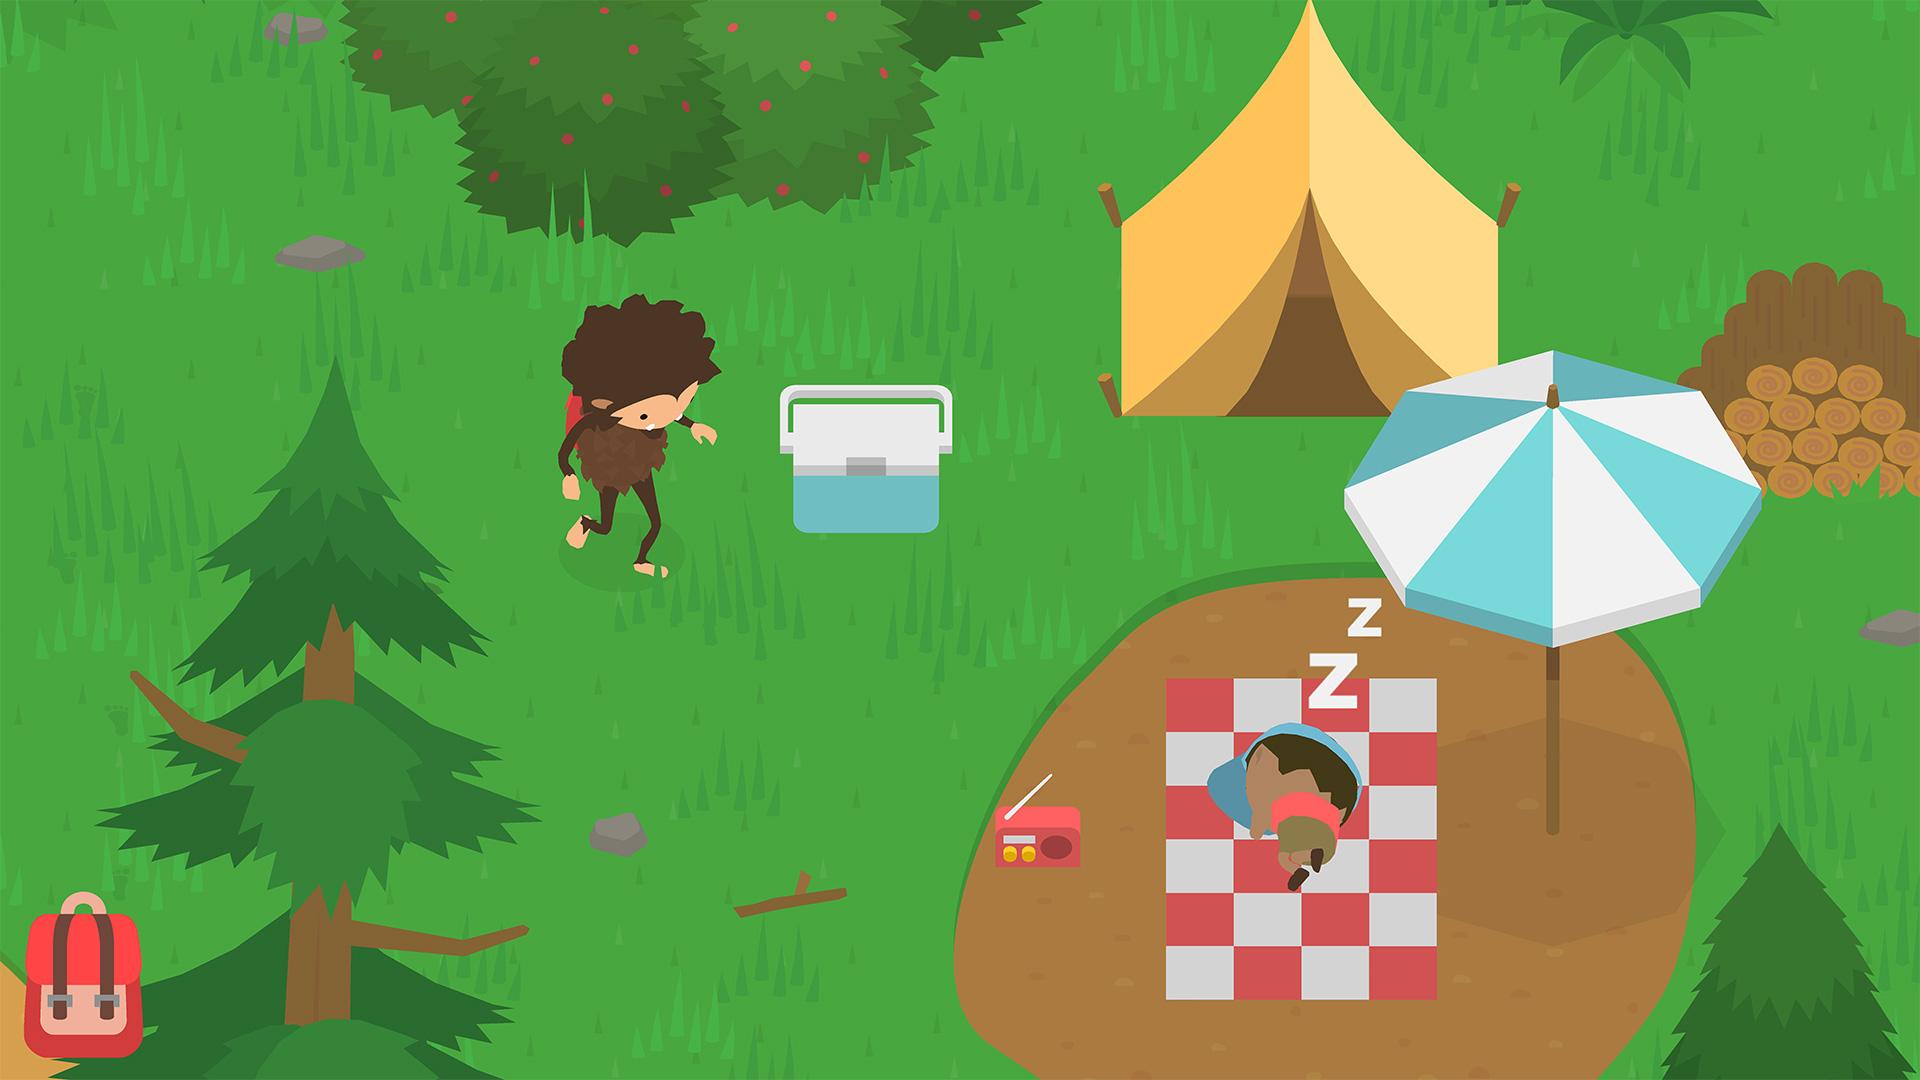 Game image Sneaky Sasquatch